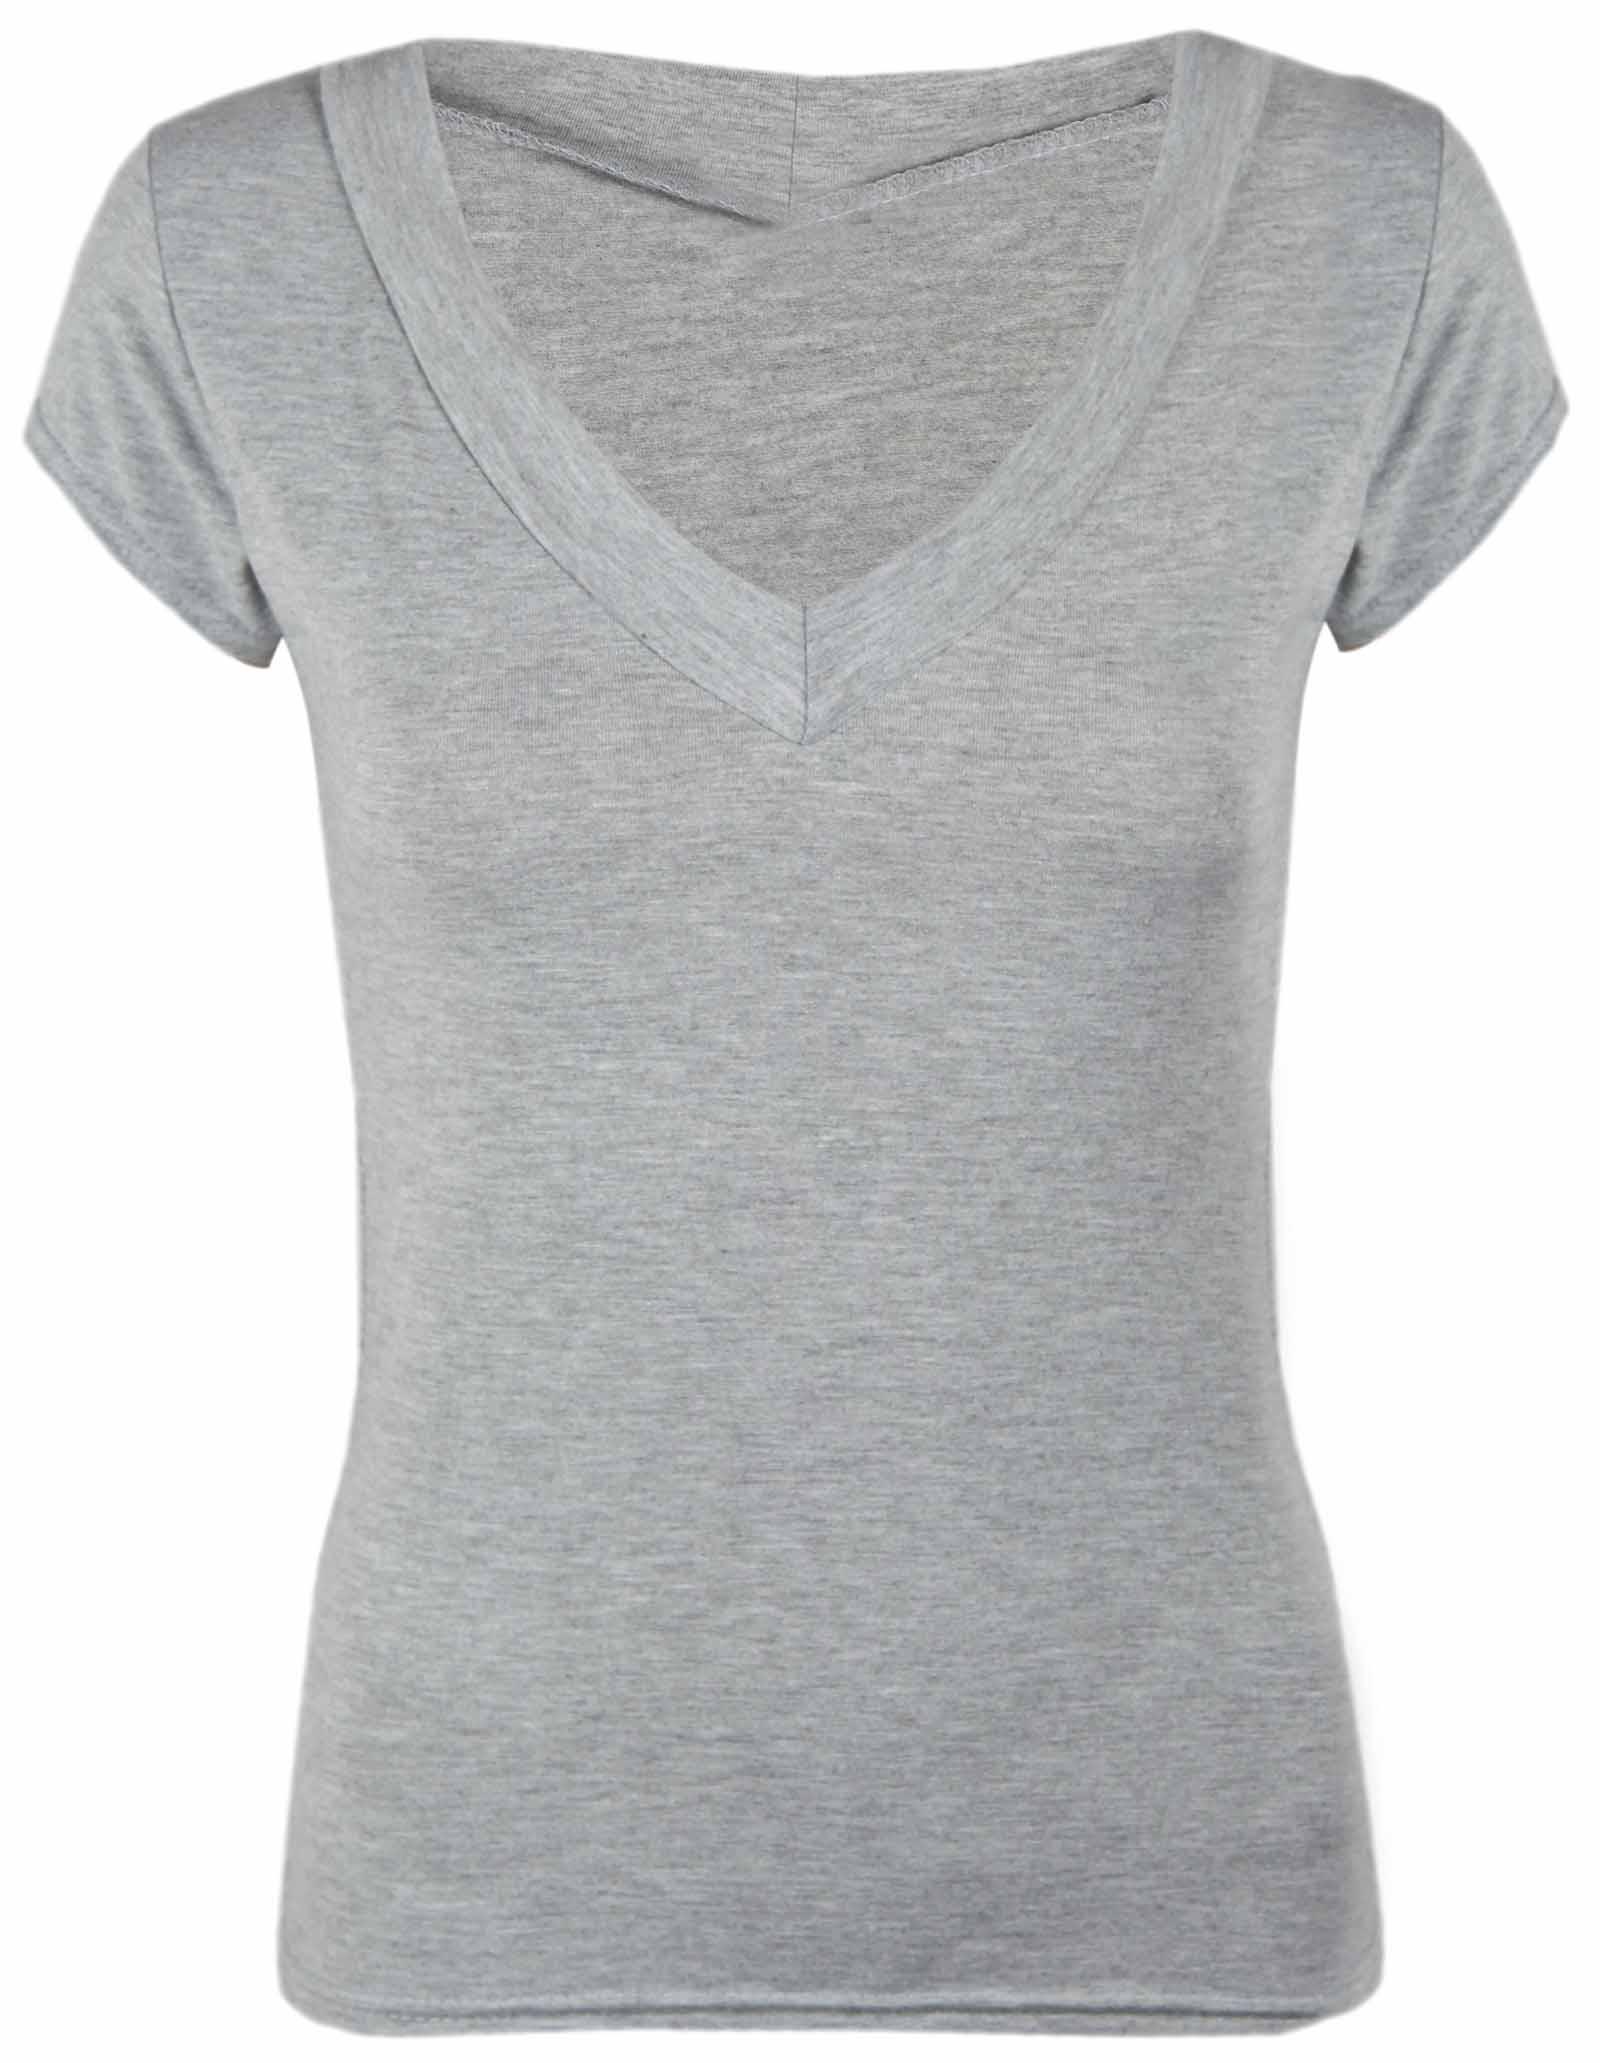 Plain black t shirt quality - Plain Black Fitted T Shirt